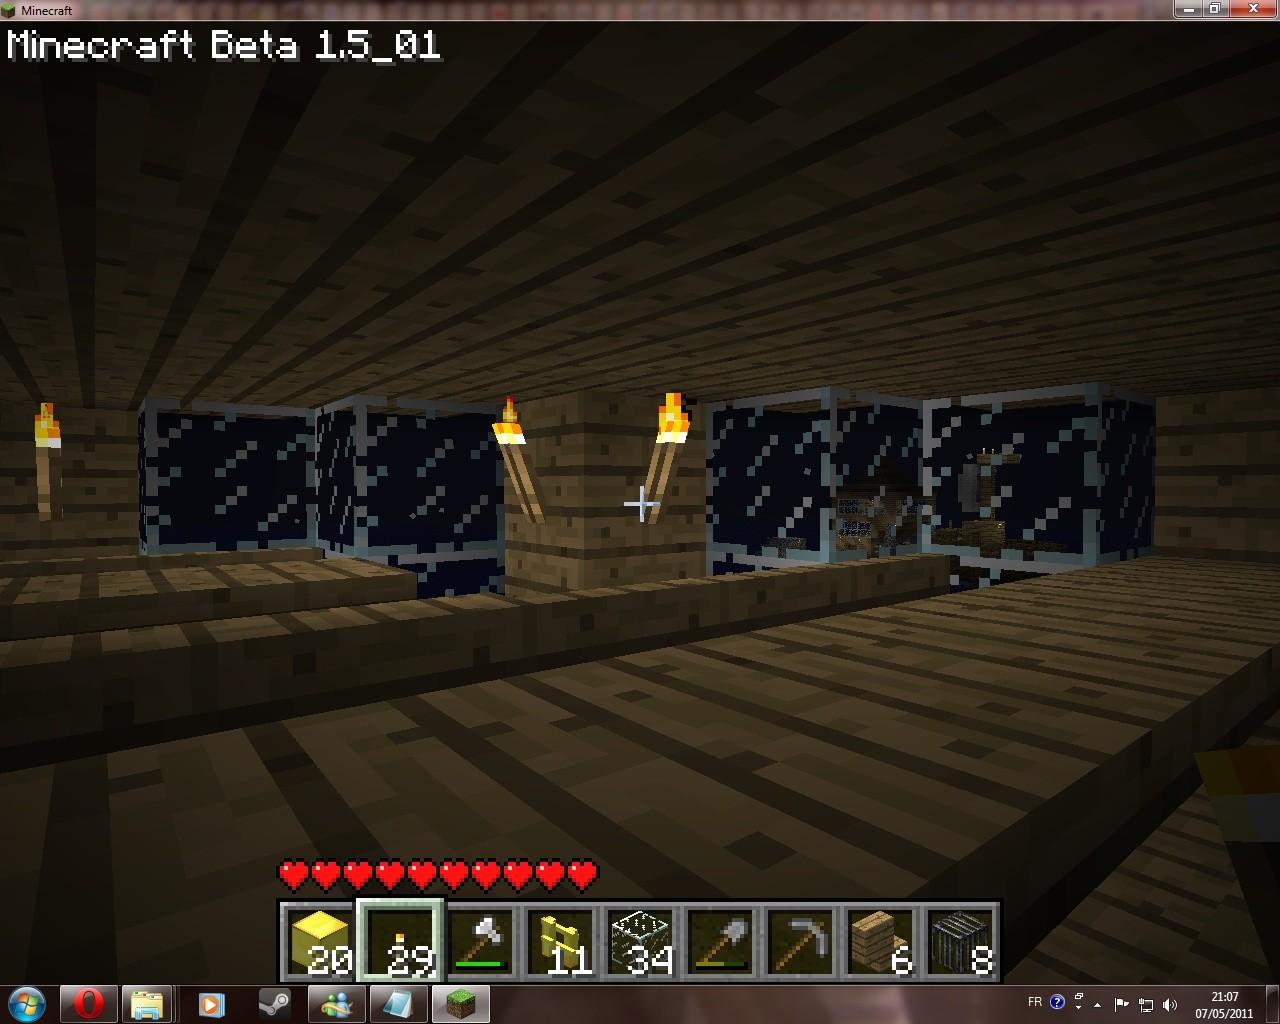 [Minecraft] Mon chez moi (moi moi chez moi moi moiiiii) - Page 5 New_bi19